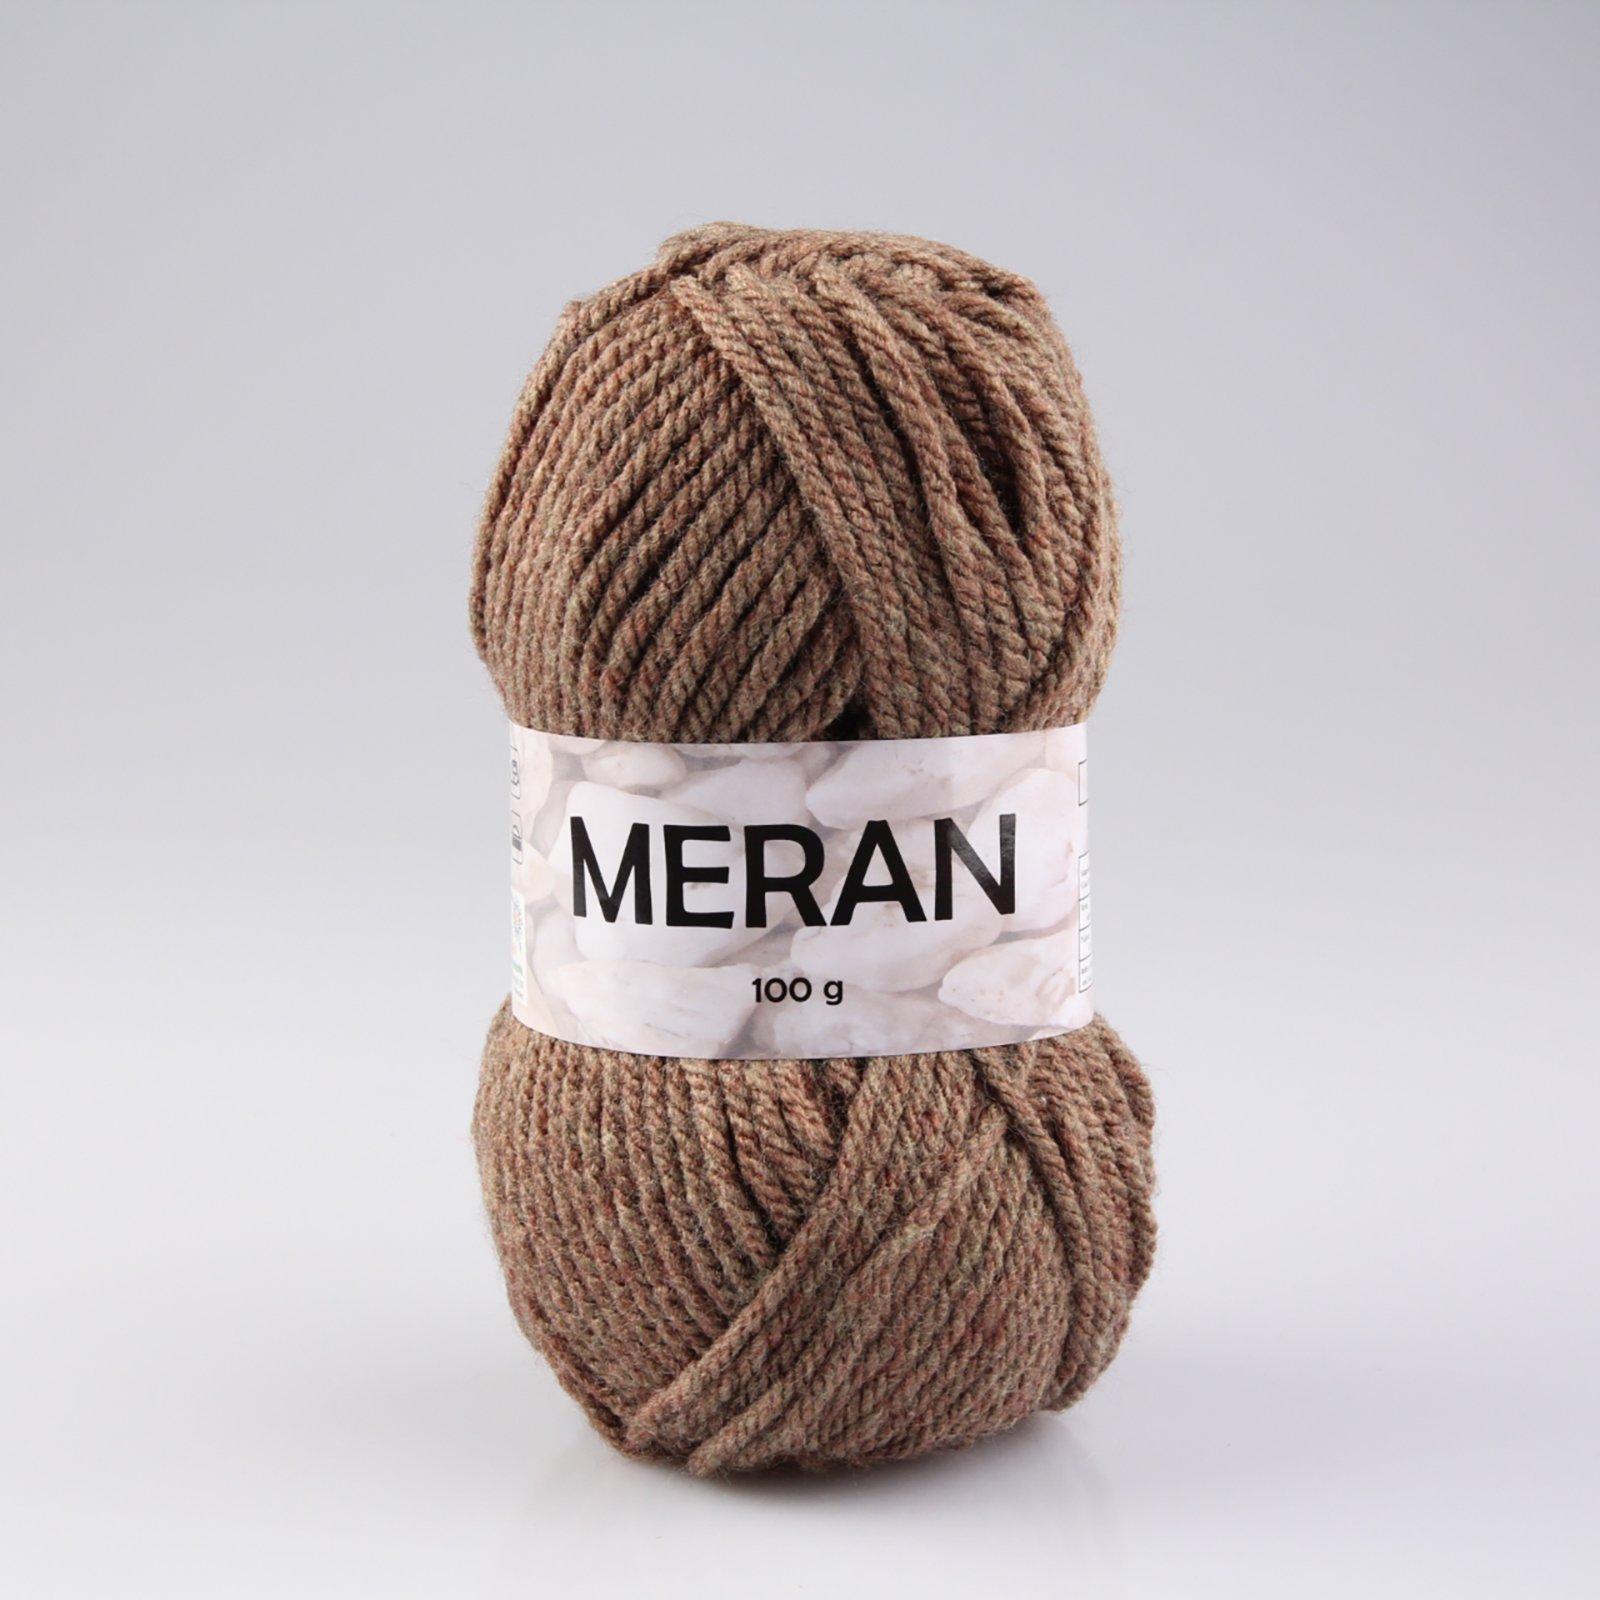 Wolle MERAN - braun - 100g